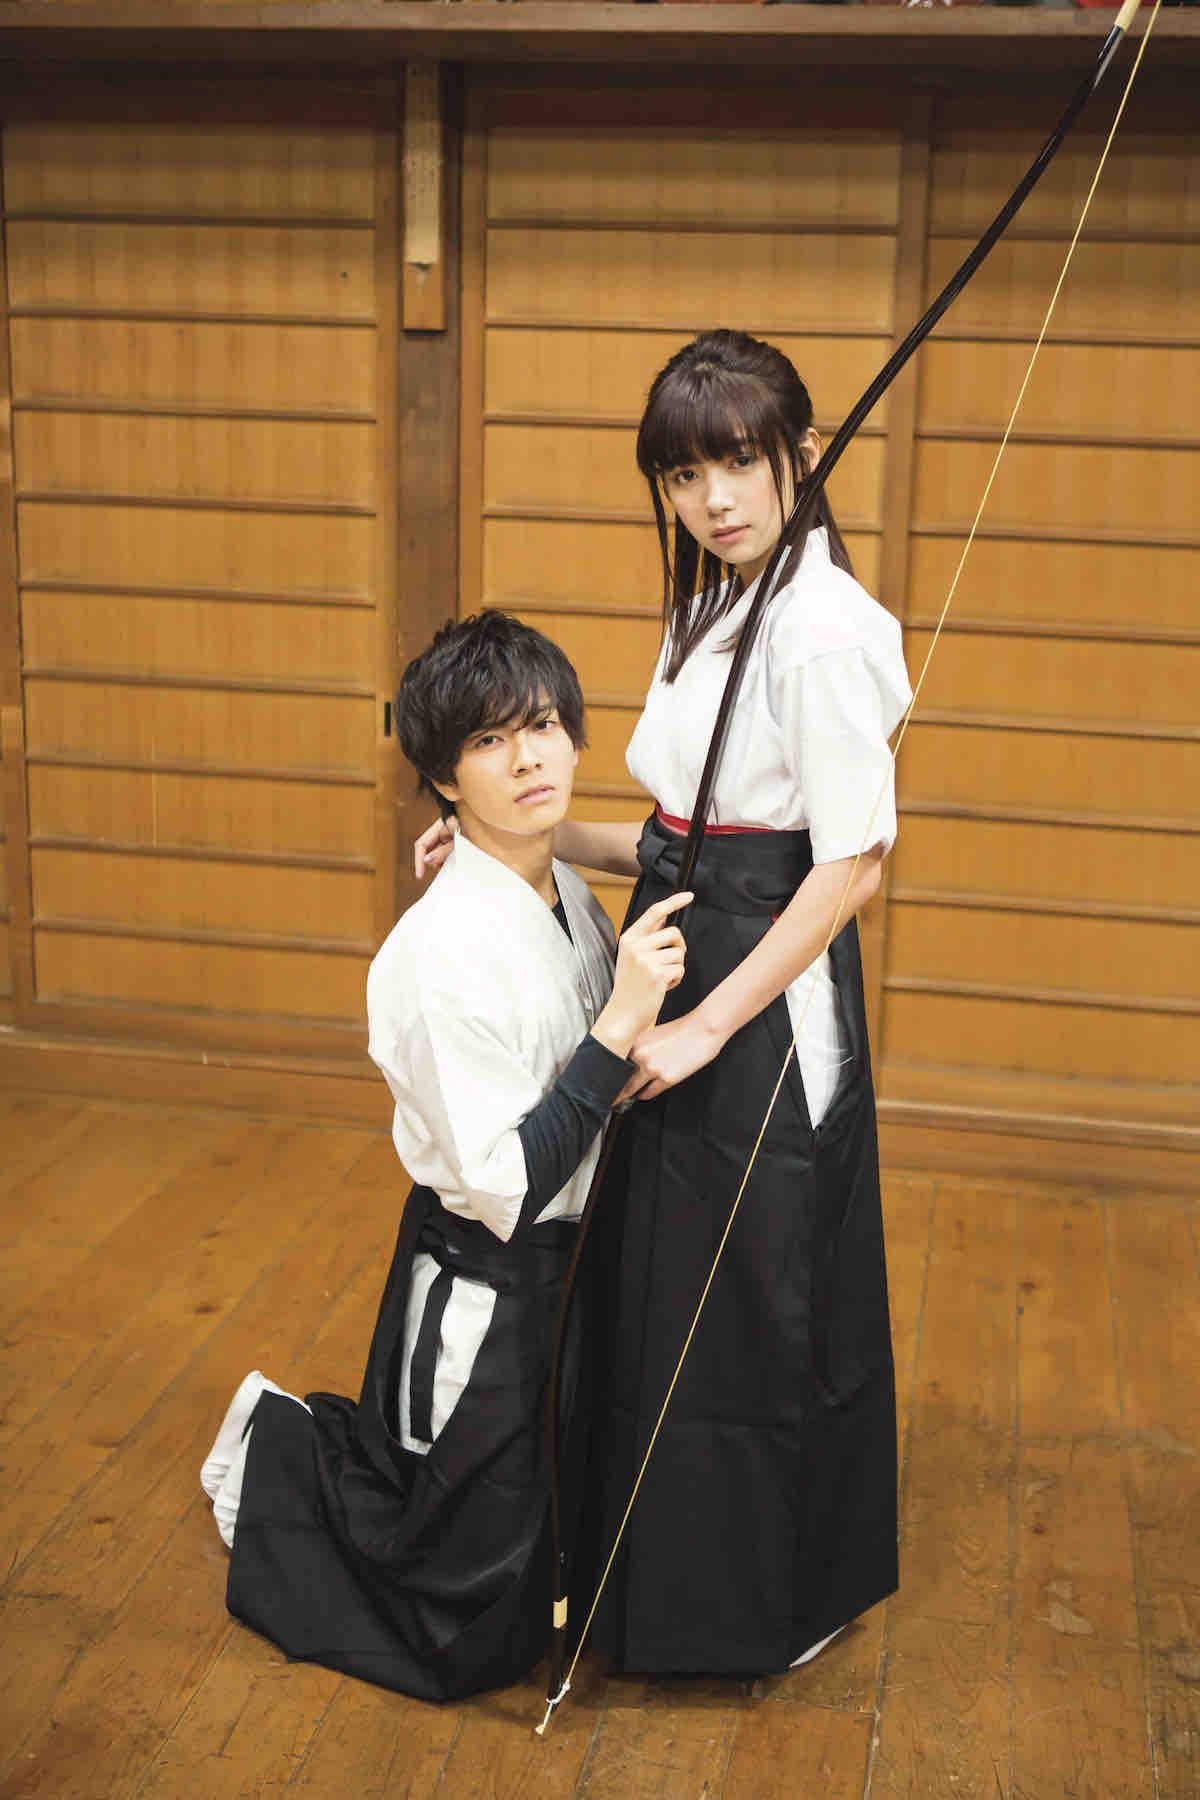 2017 Live-Action Adaptations from Shoujo and Josei Manga